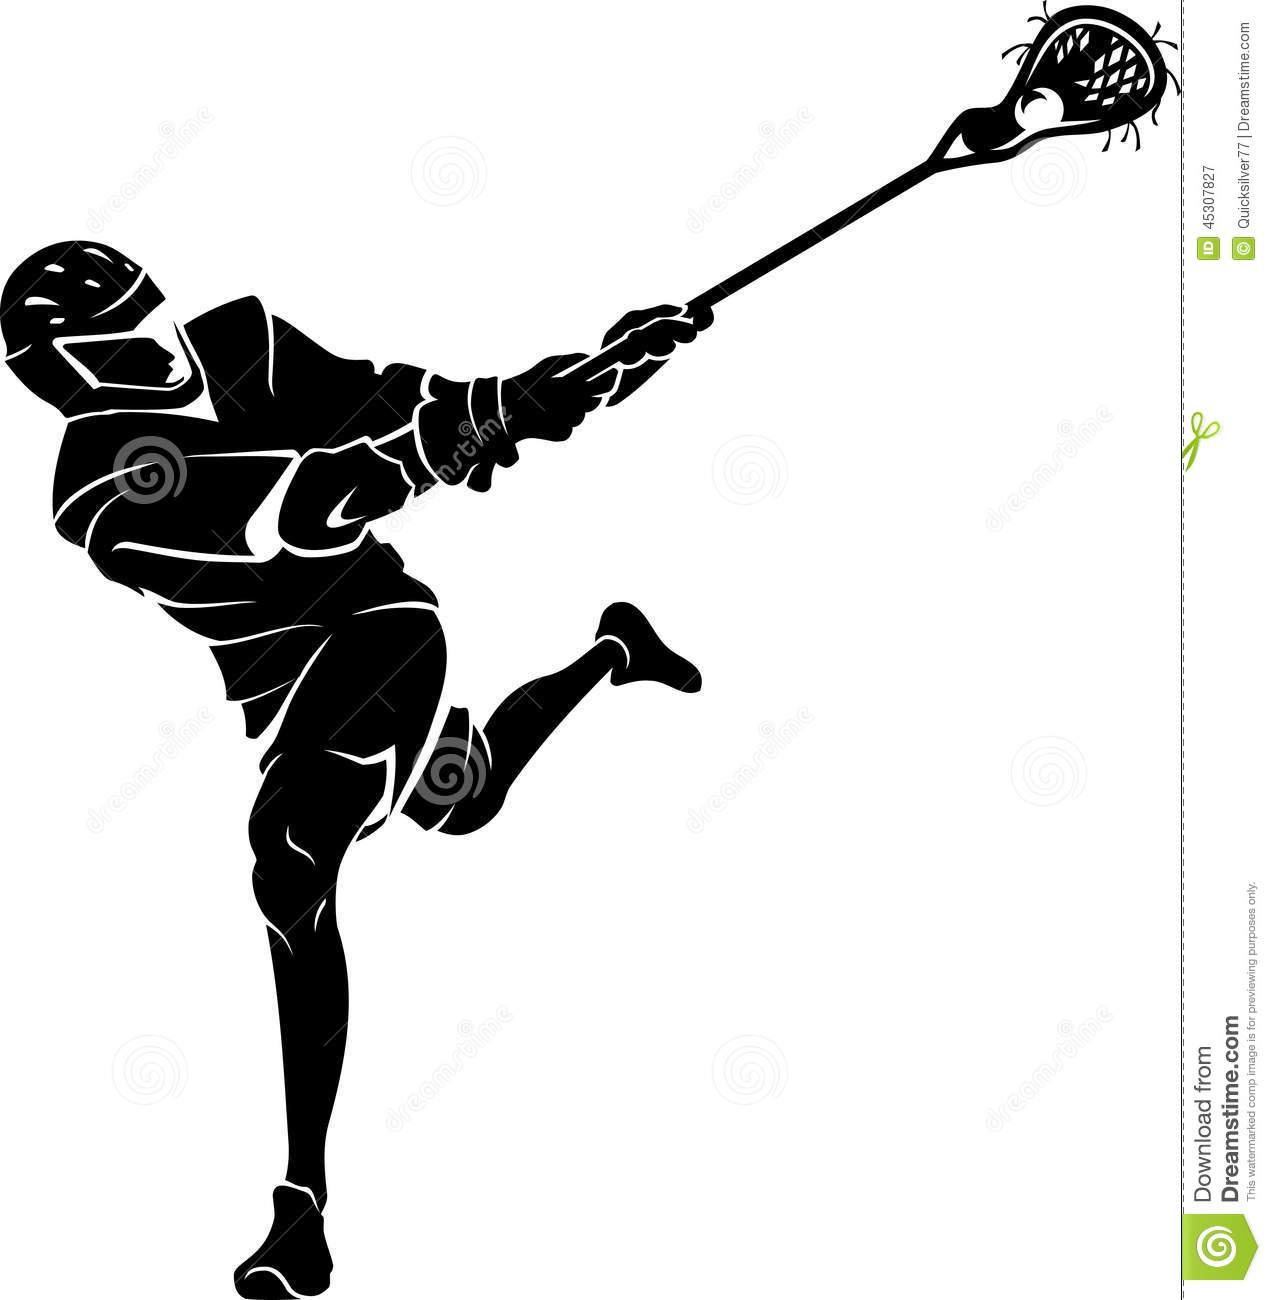 lacrosse silhouette clip art at getdrawings com free for personal rh getdrawings com Lacrosse Stick Graphic Lacrosse Goalie Stick Clip Art